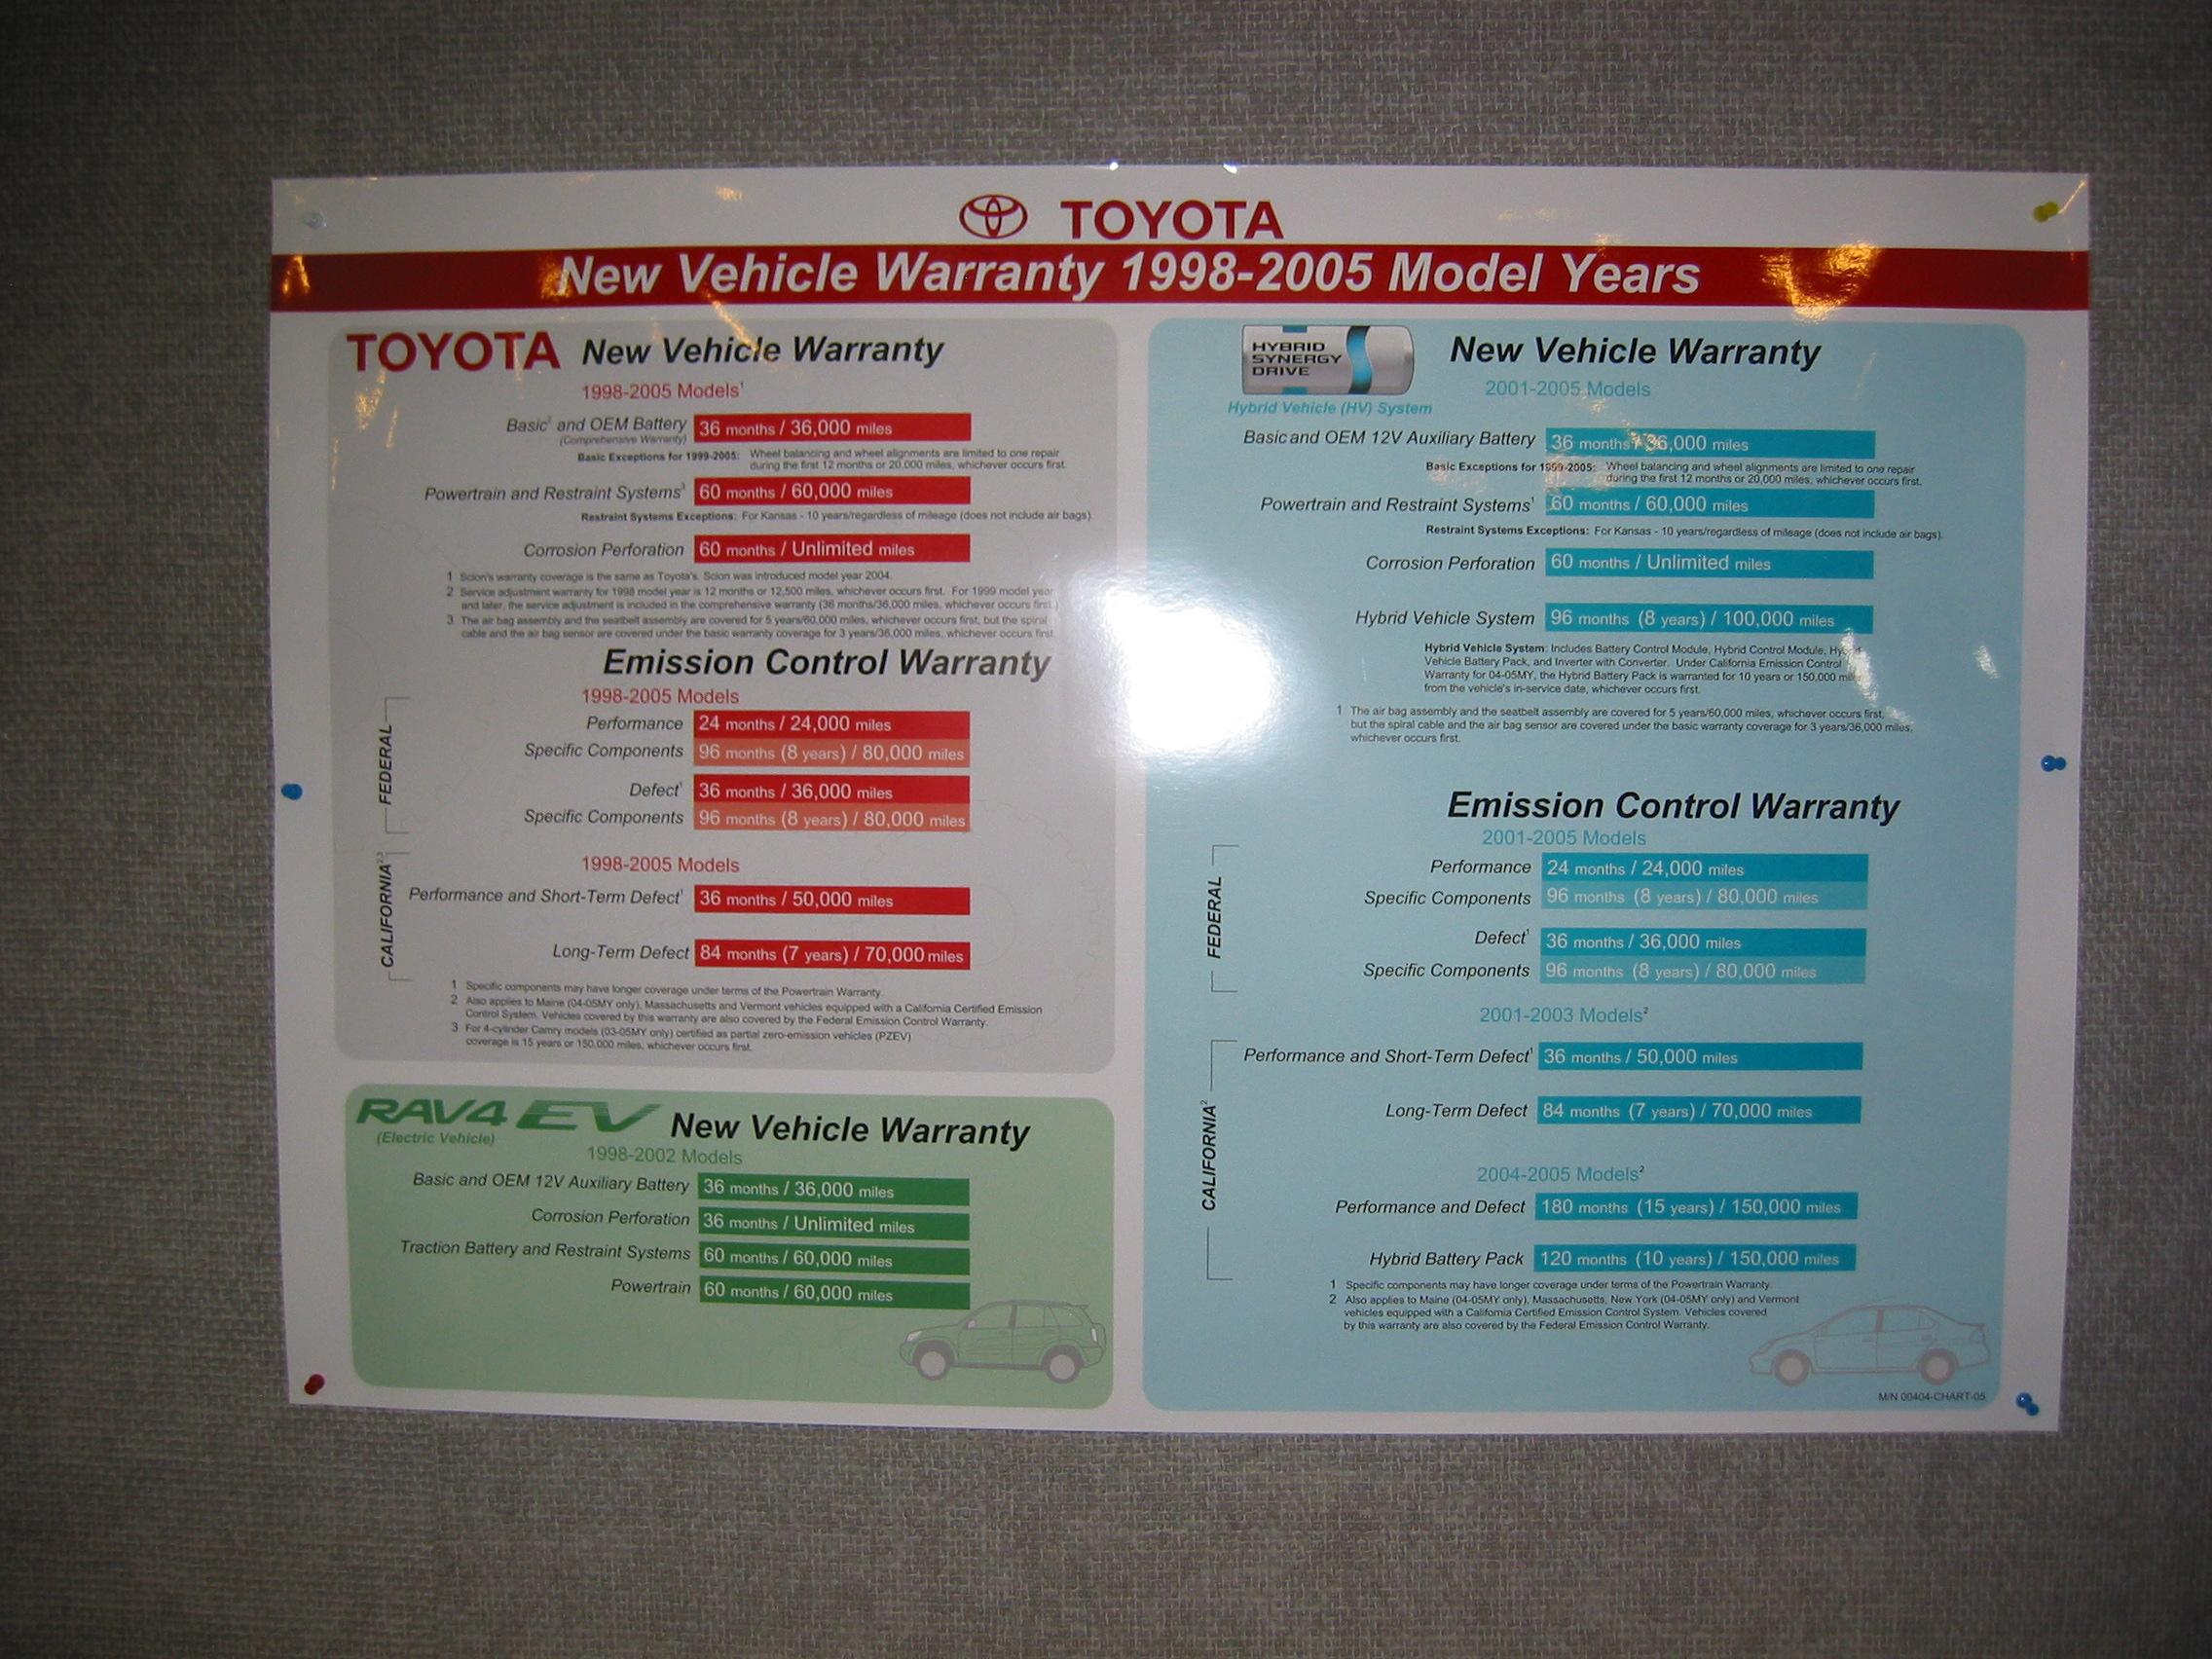 Penske Toyota BDC Q&A Service Warranty Posters